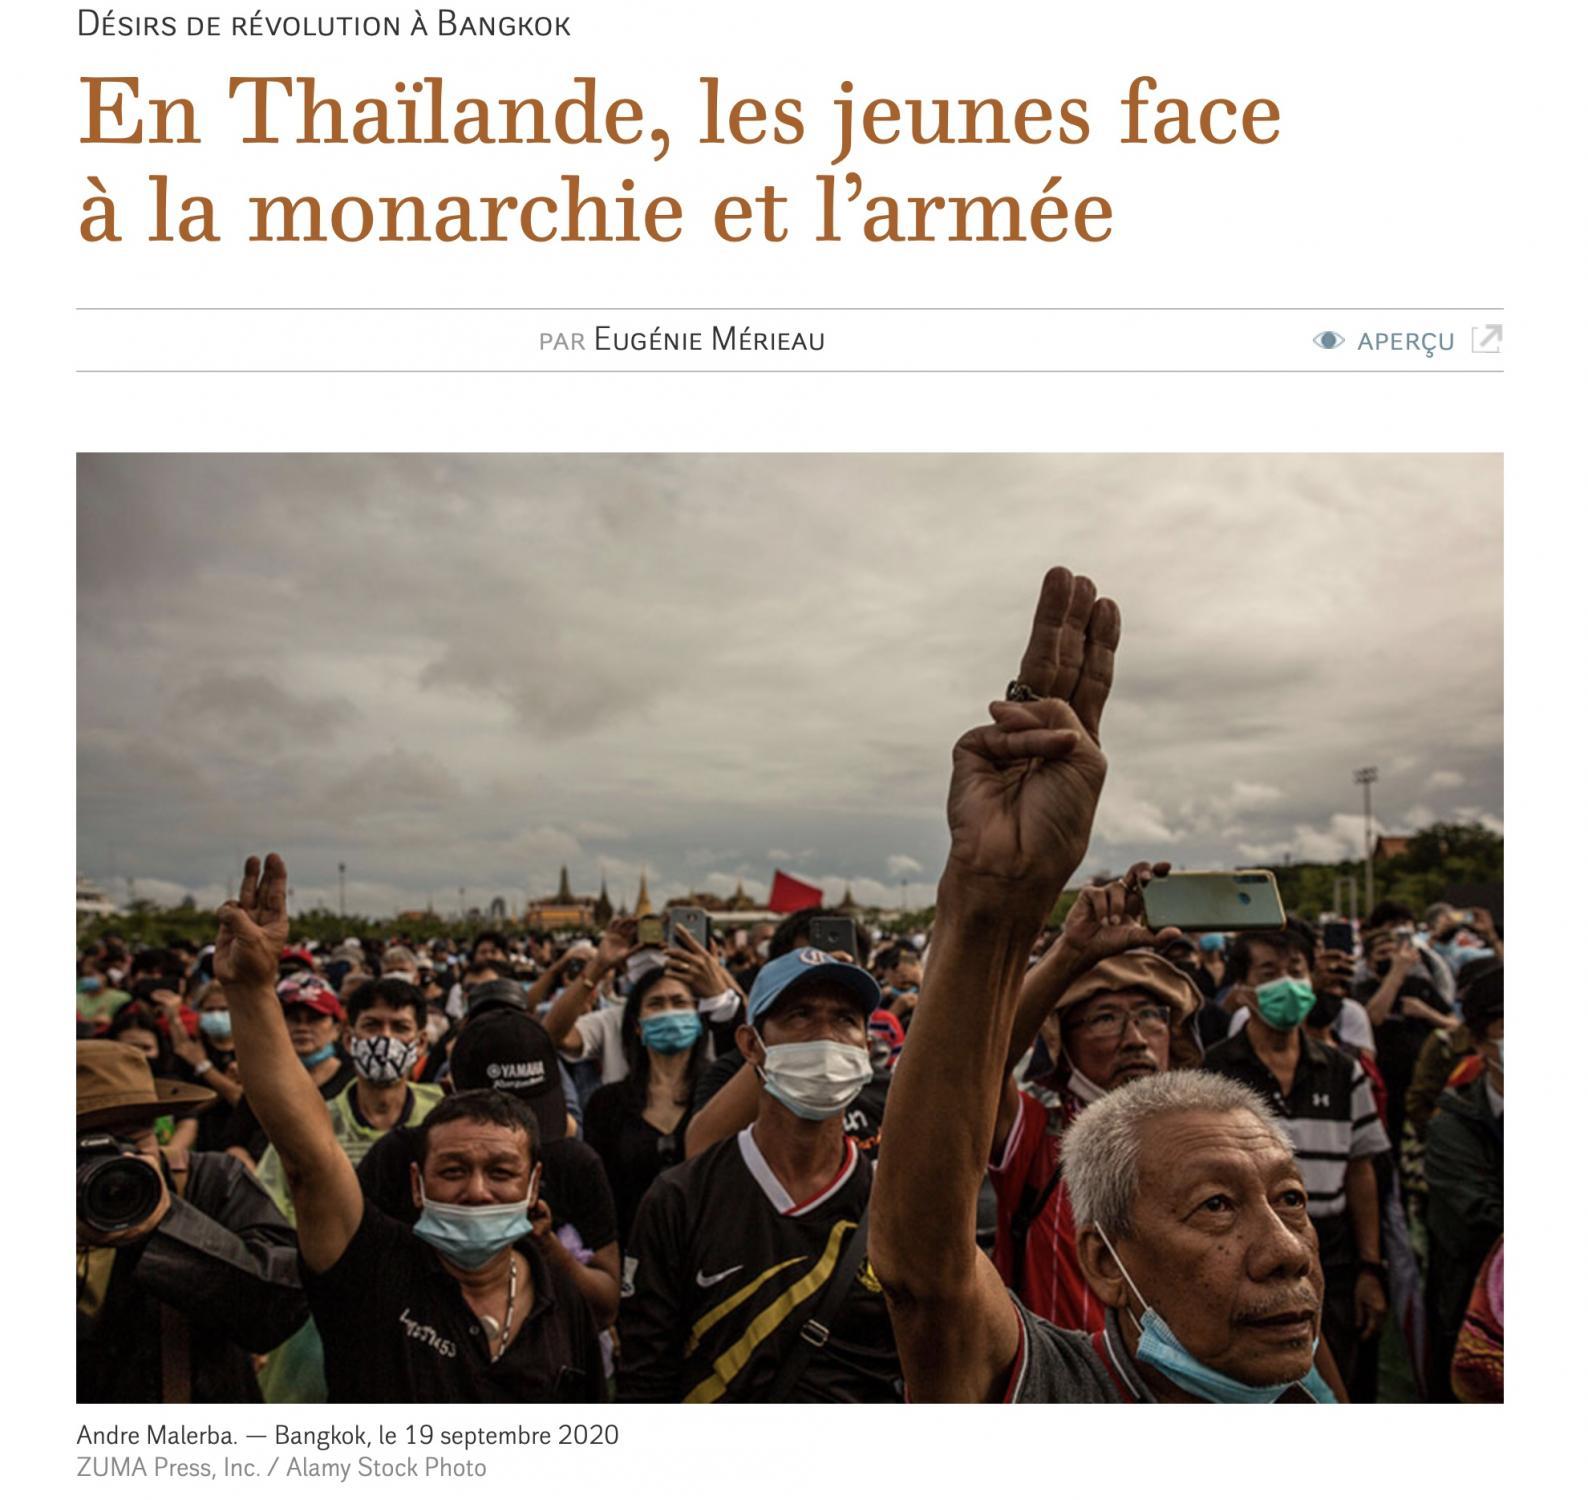 Le Monde diplomatique, January 2021.